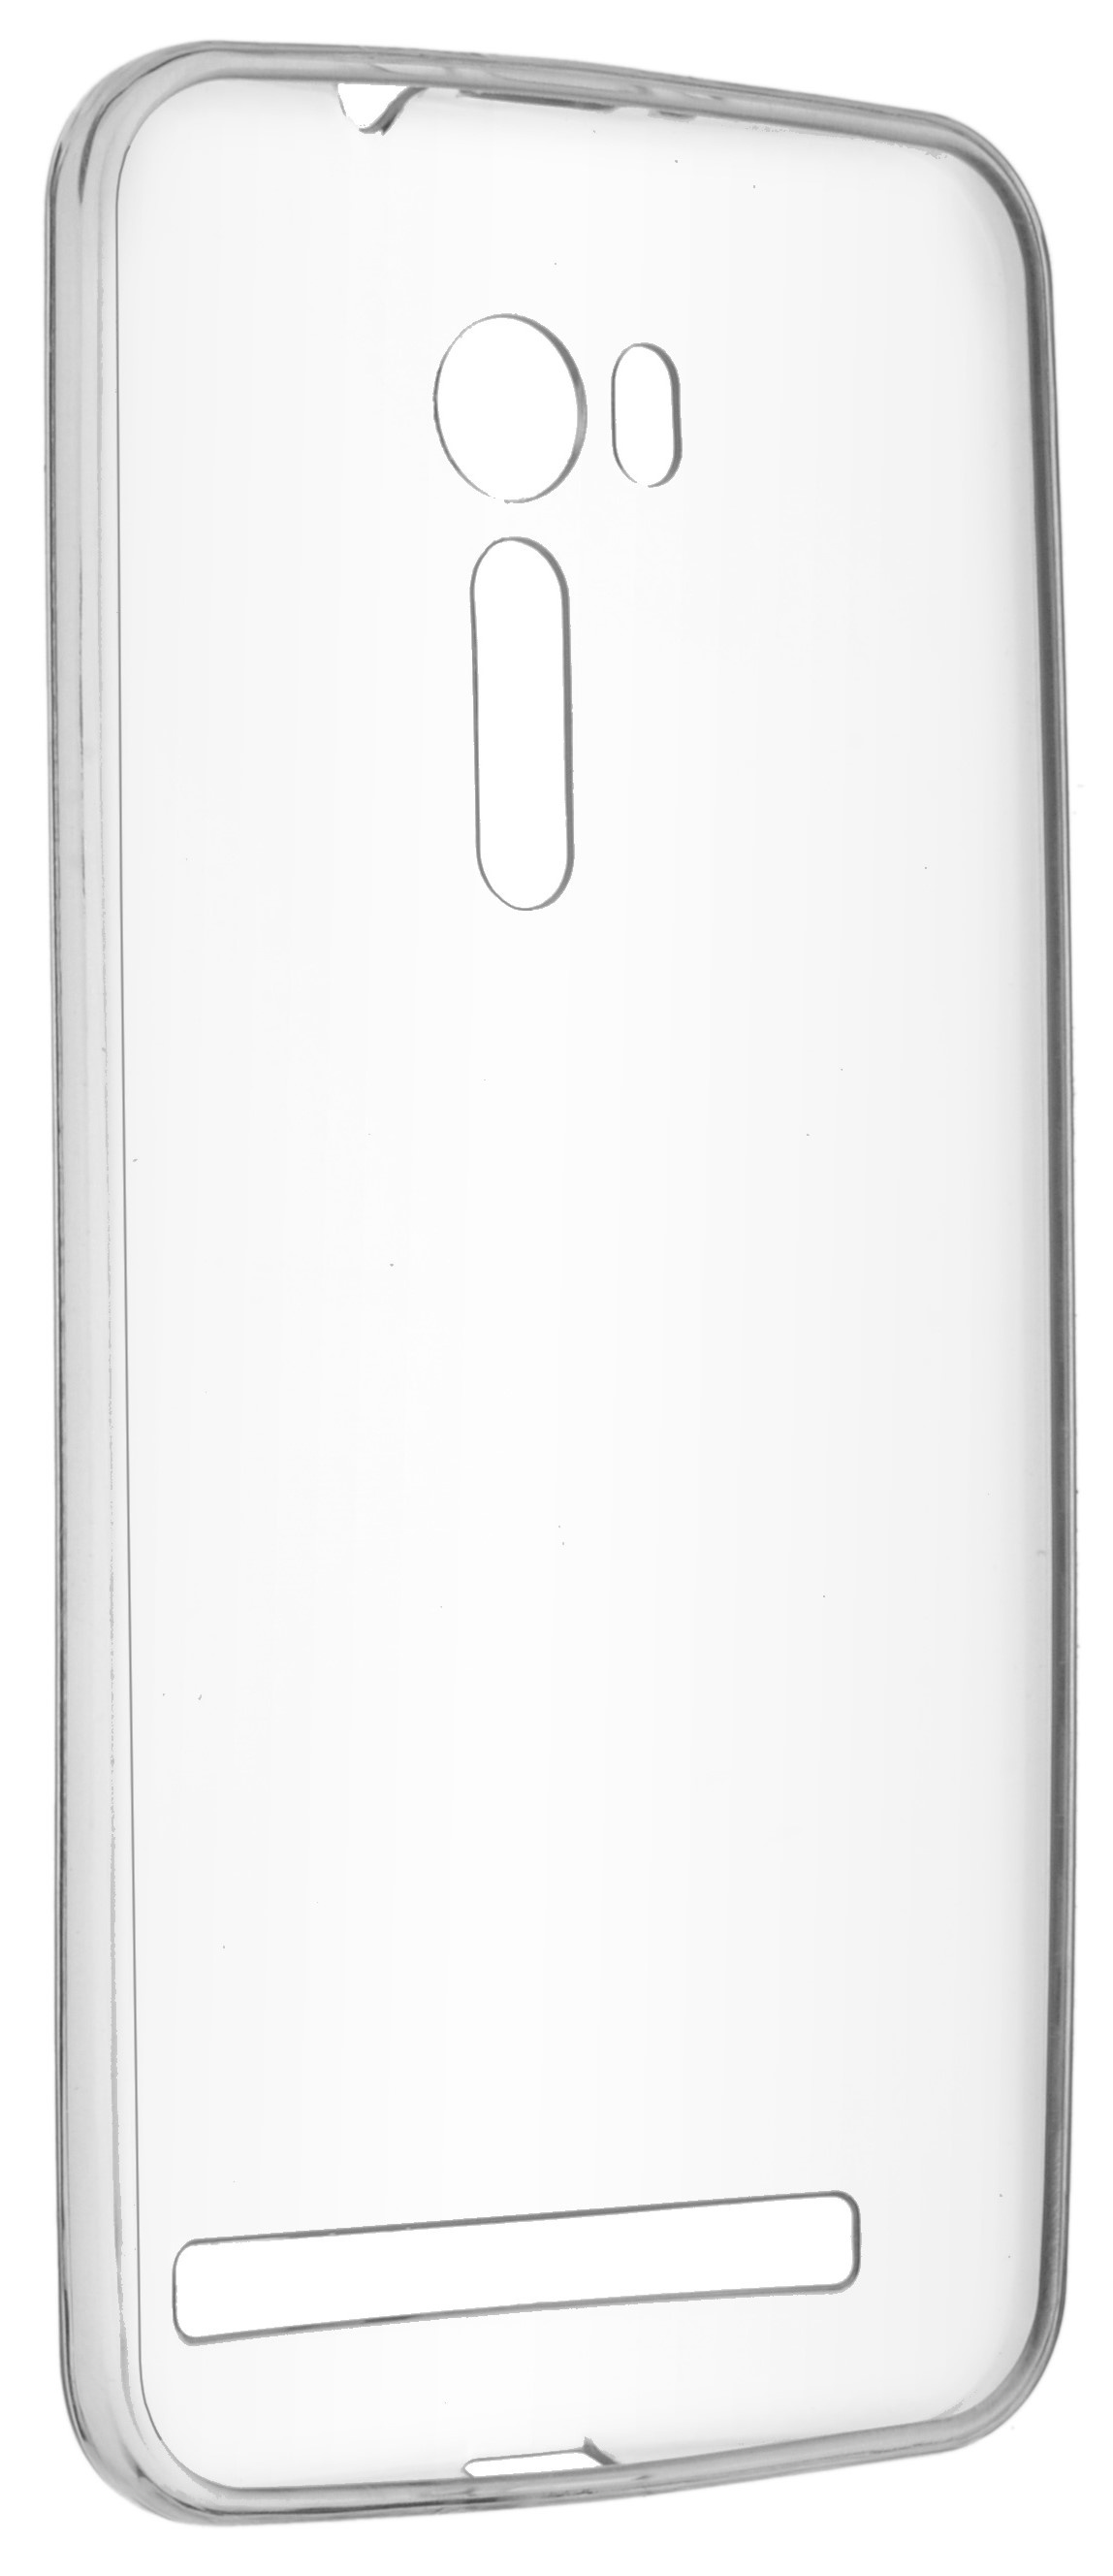 Чехол для сотового телефона skinBOX Slim Silicone, 4660041408218, прозрачный цена и фото